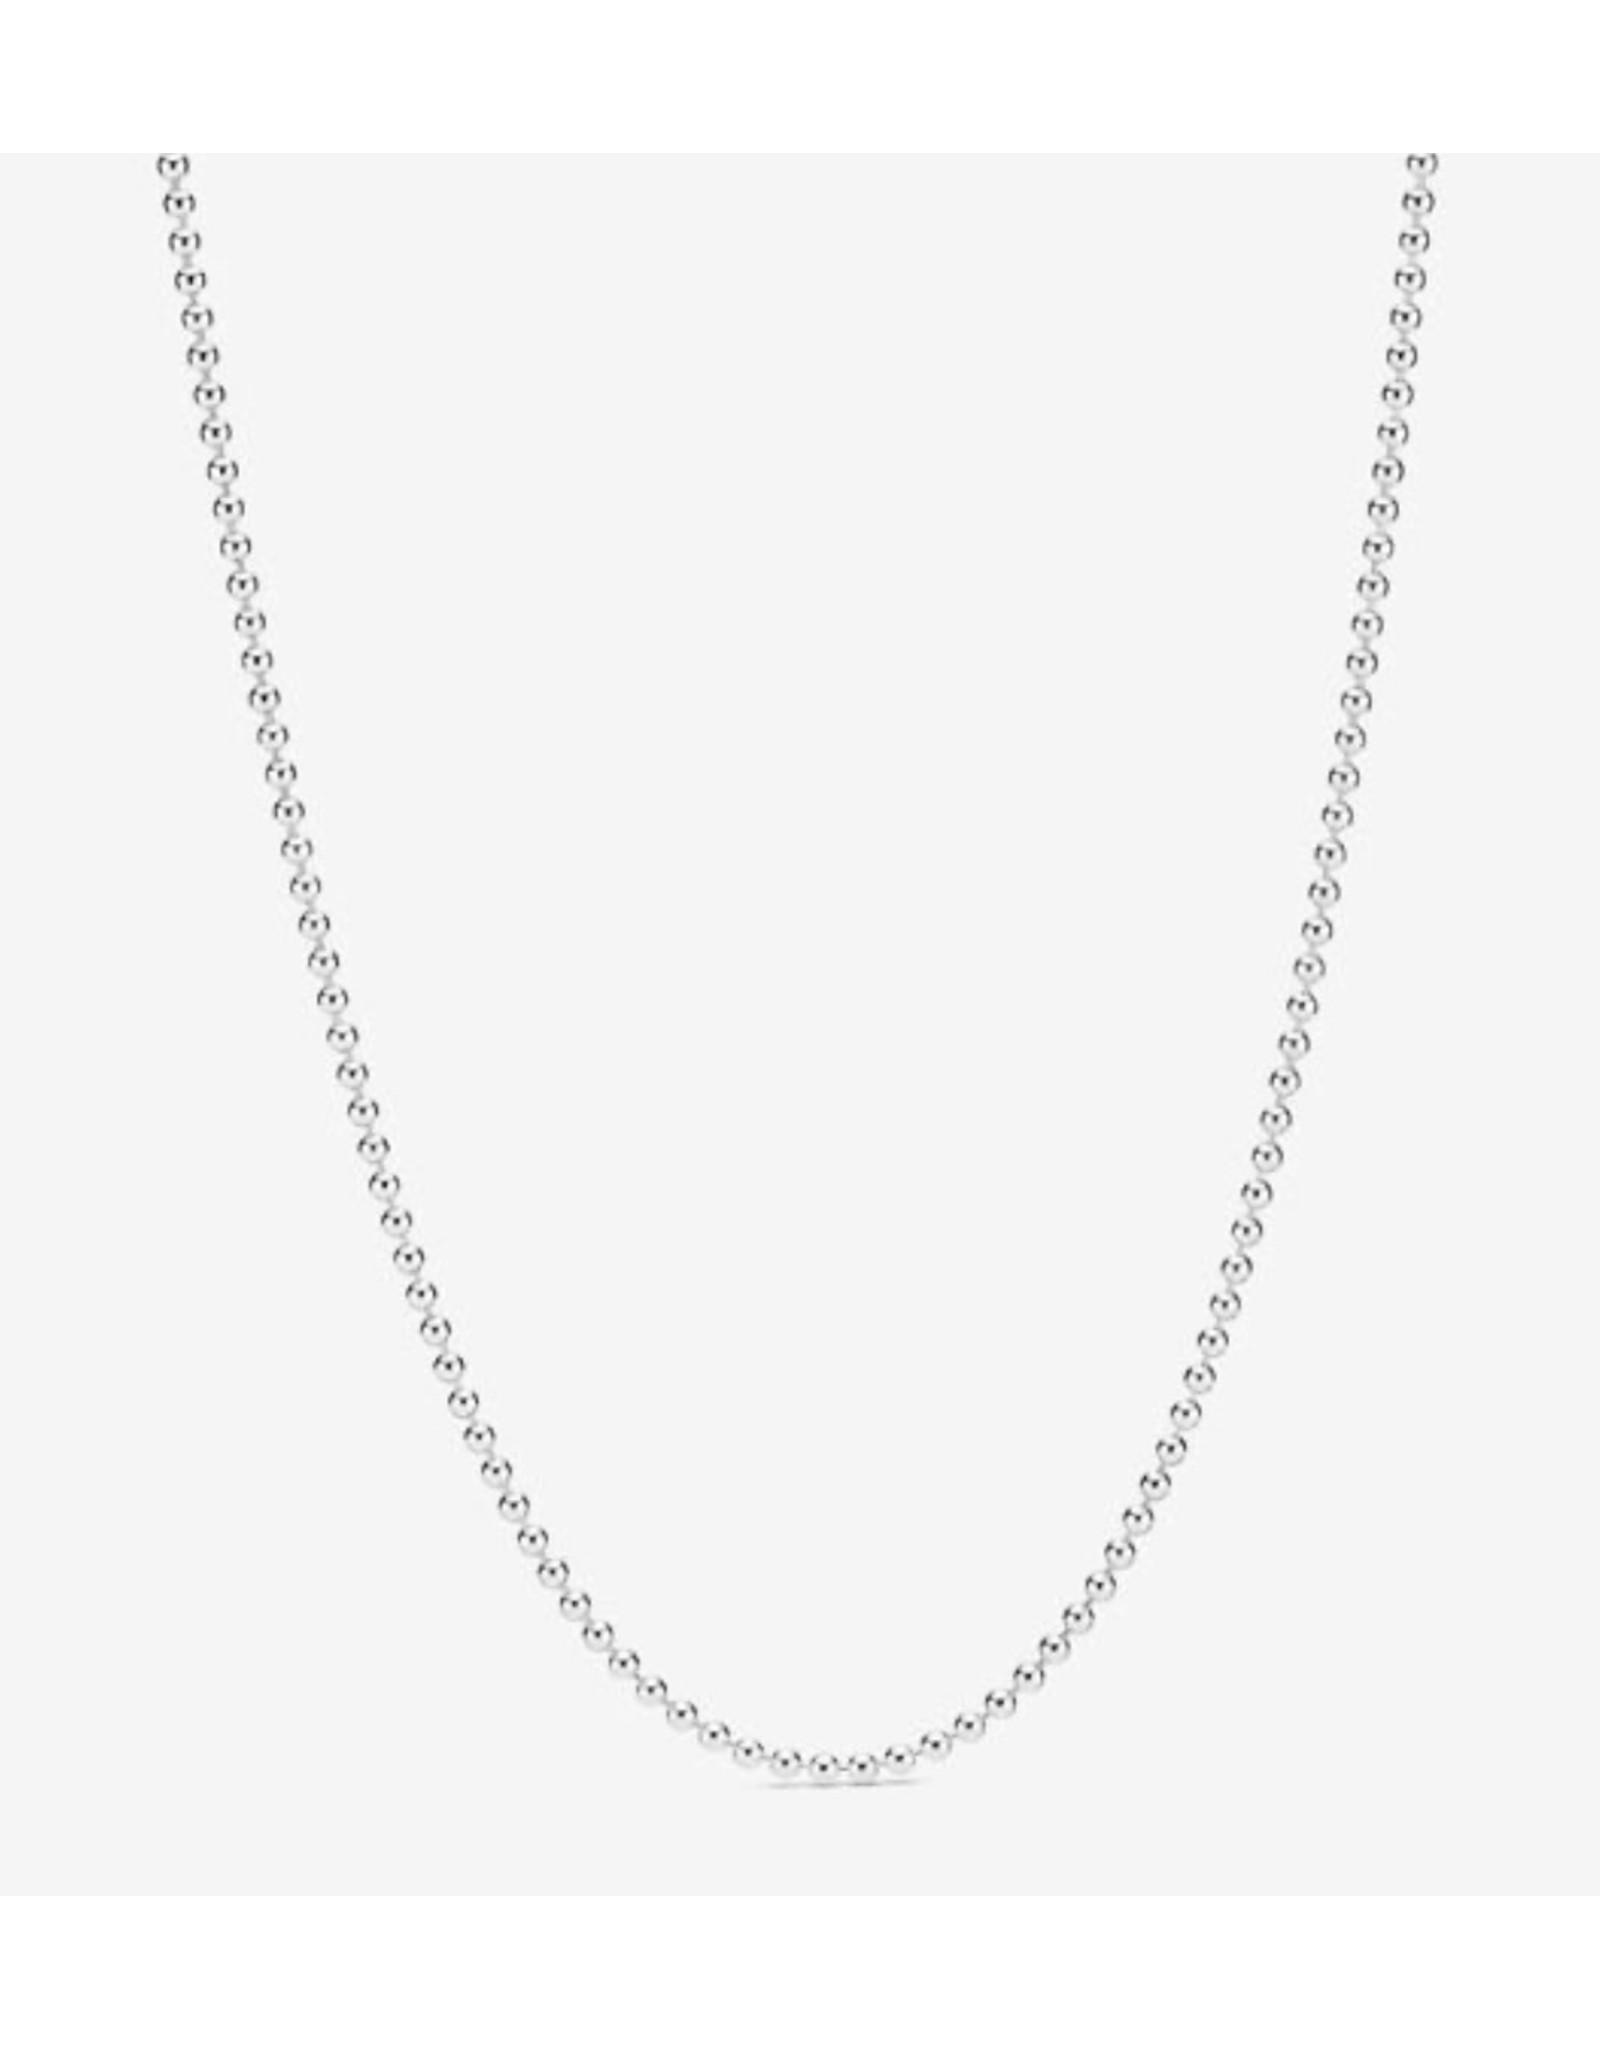 Pandora Pandora Necklace,399104C00-60, Polished Ball Chain, Sterling Silver